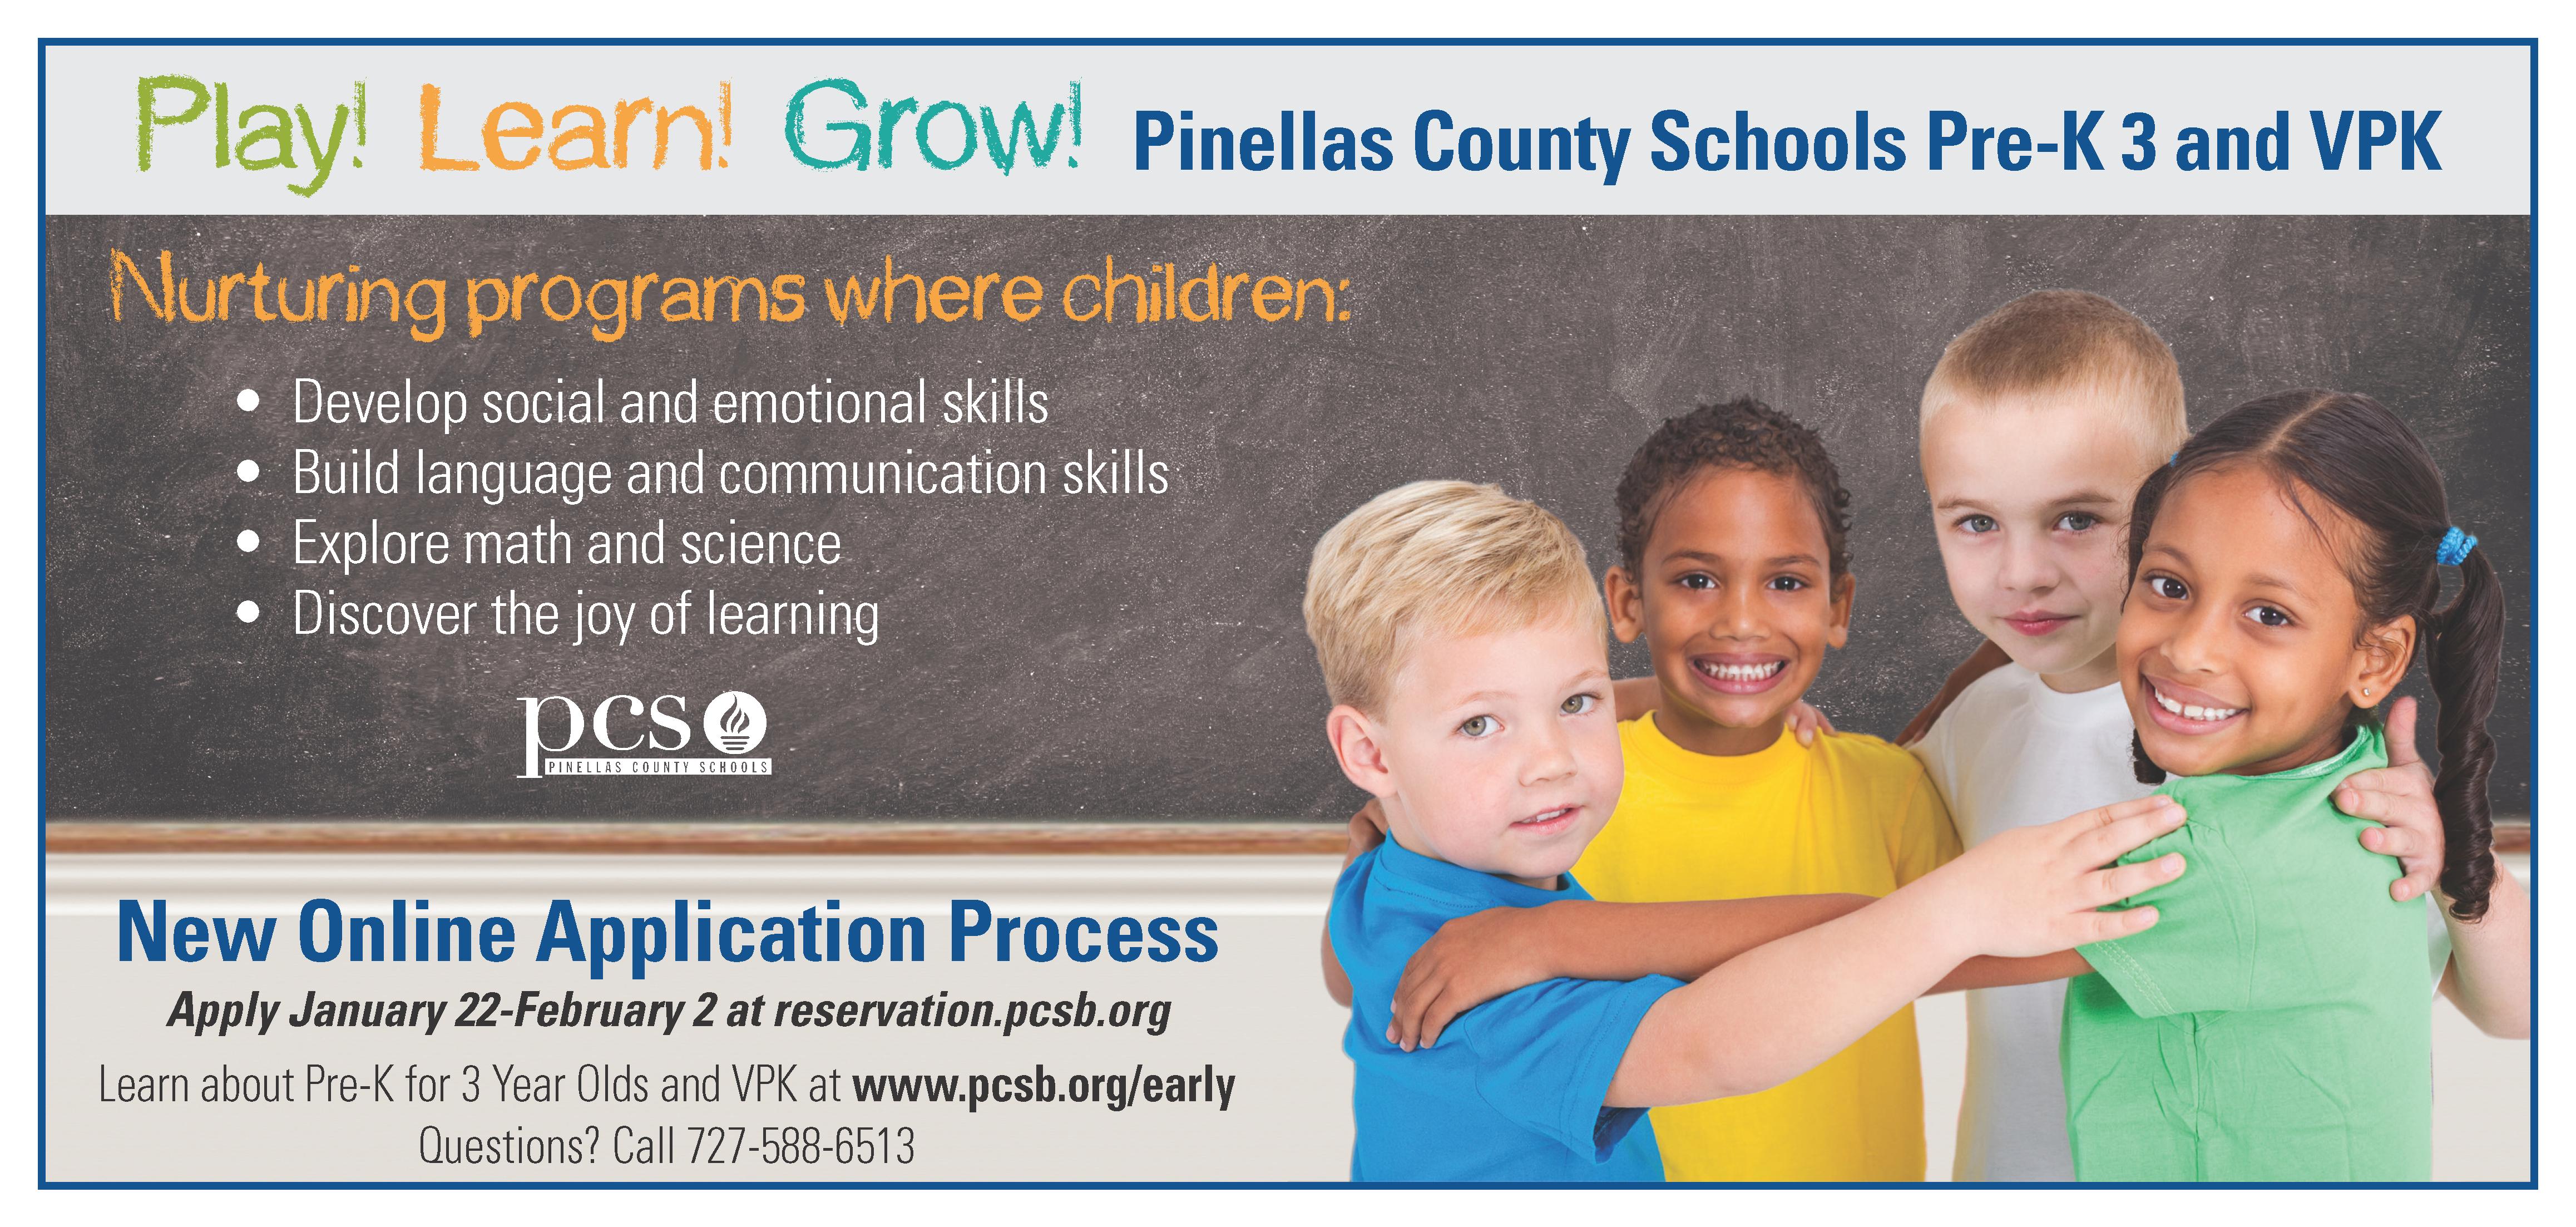 VPK, Pinellas Schools, featured, educsation